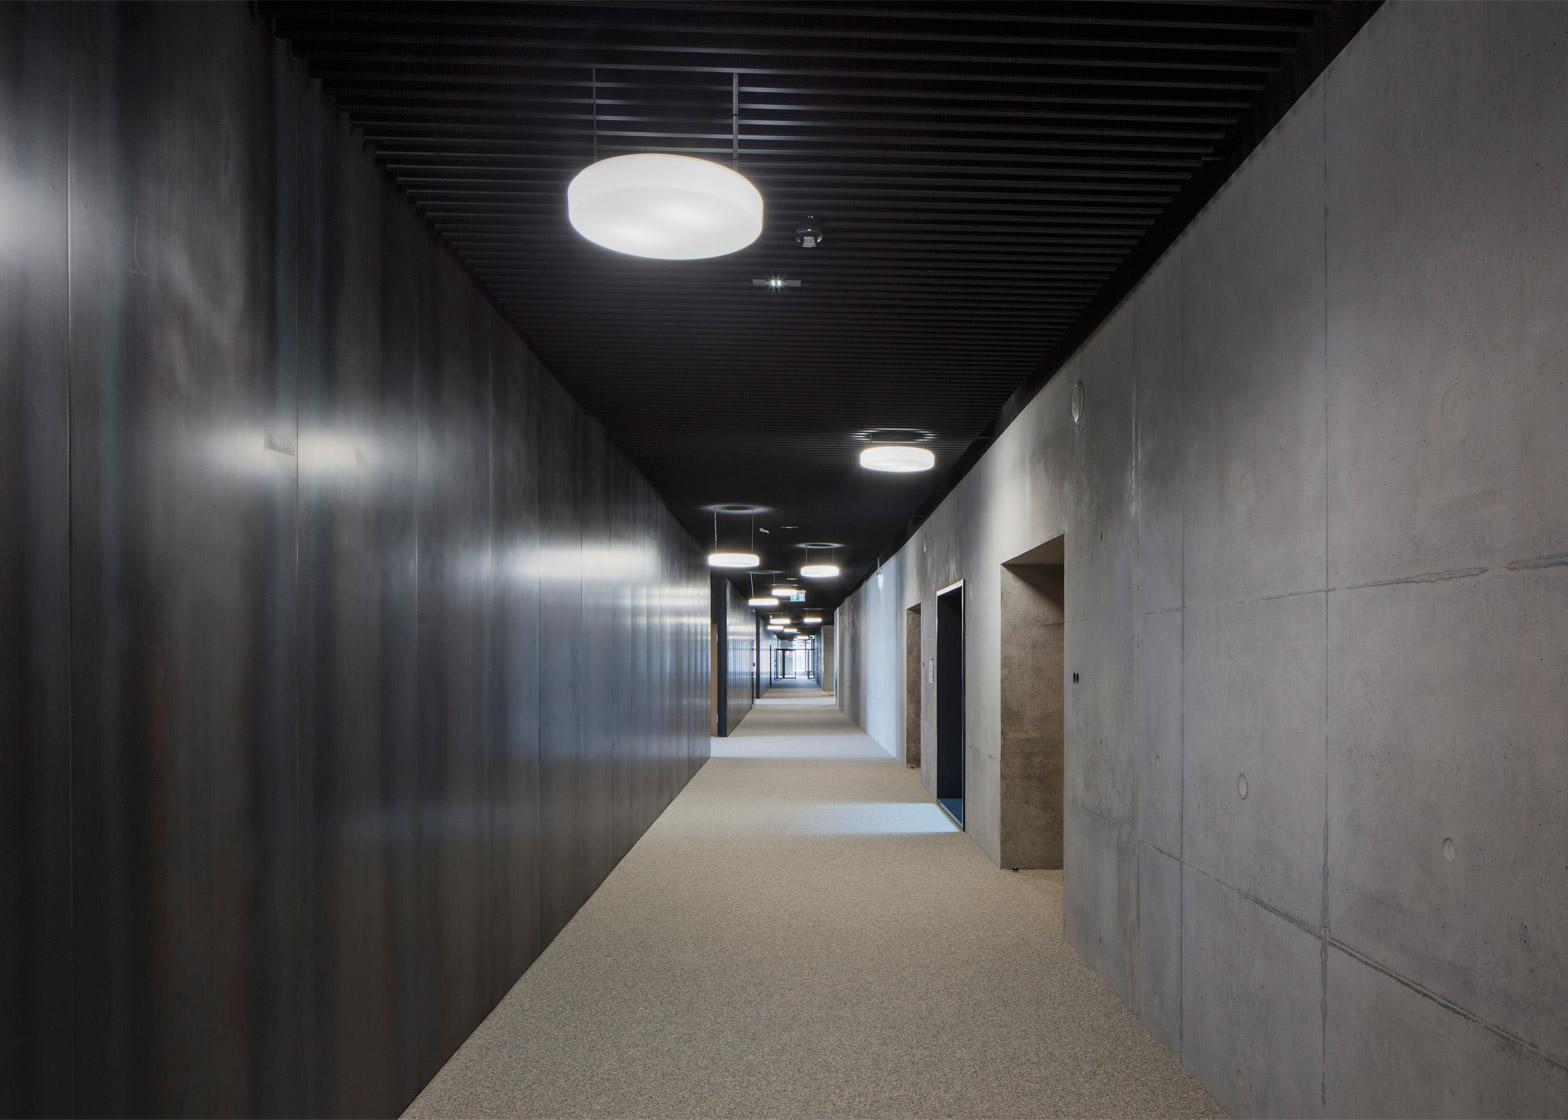 University of Luxembourg's Maison du Savoir by Baumschlager Eberle and Christian Bauer & Associés Architectes